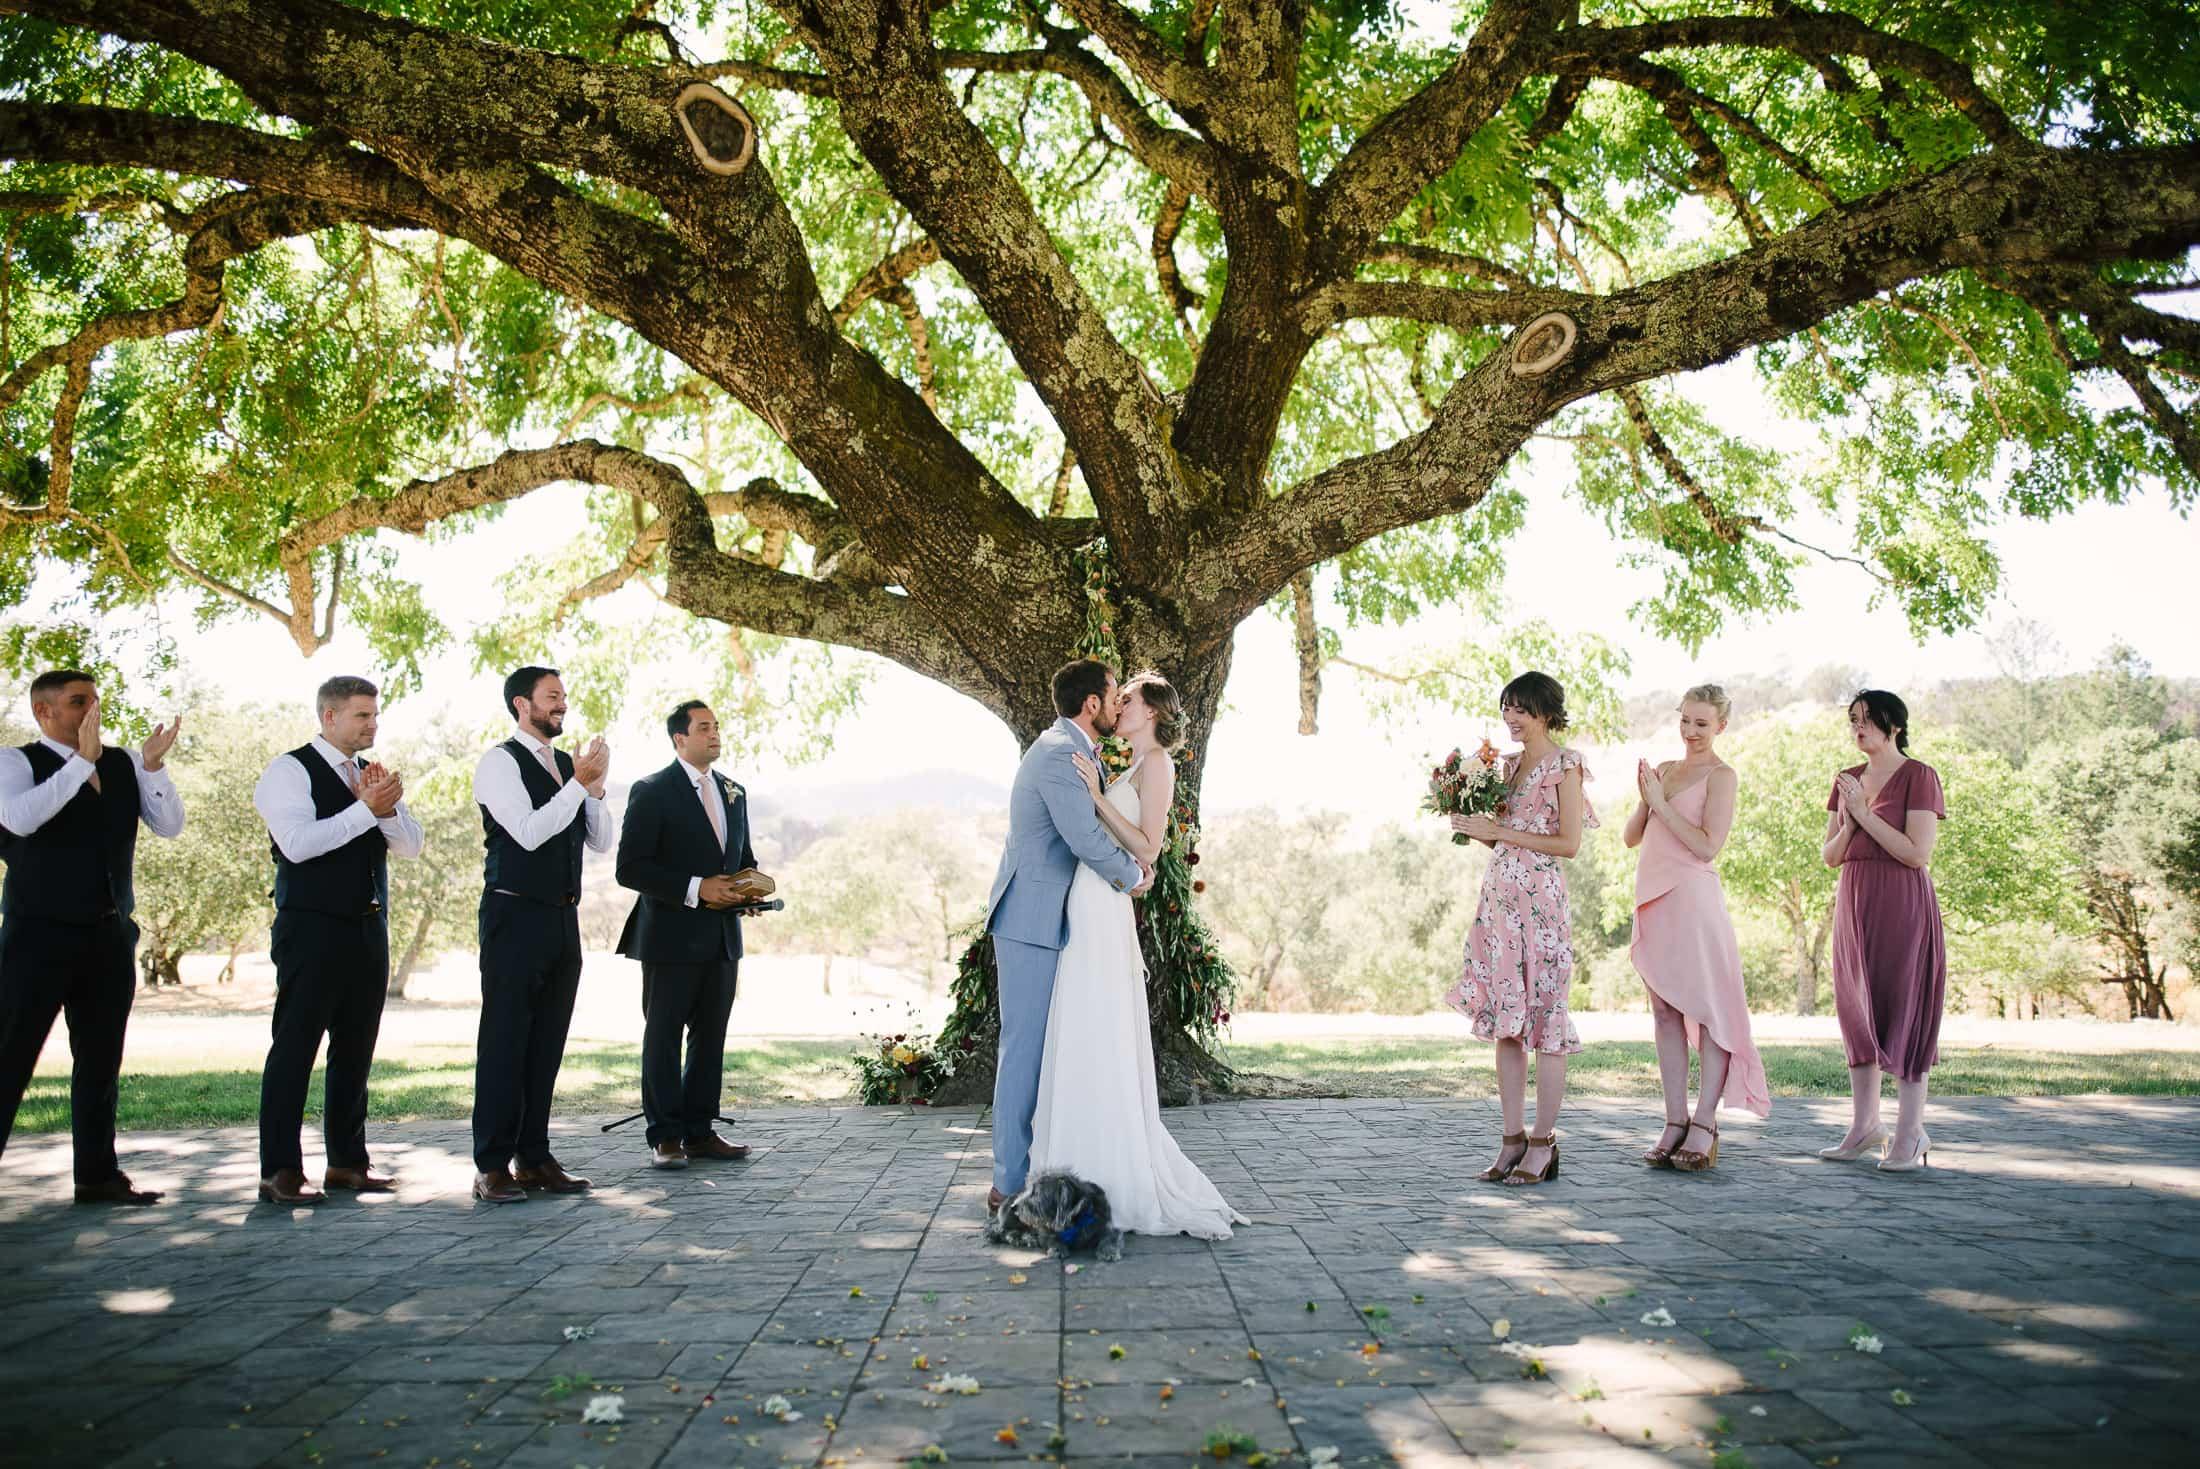 Kiss under the Walnut tree at Triple S Ranch